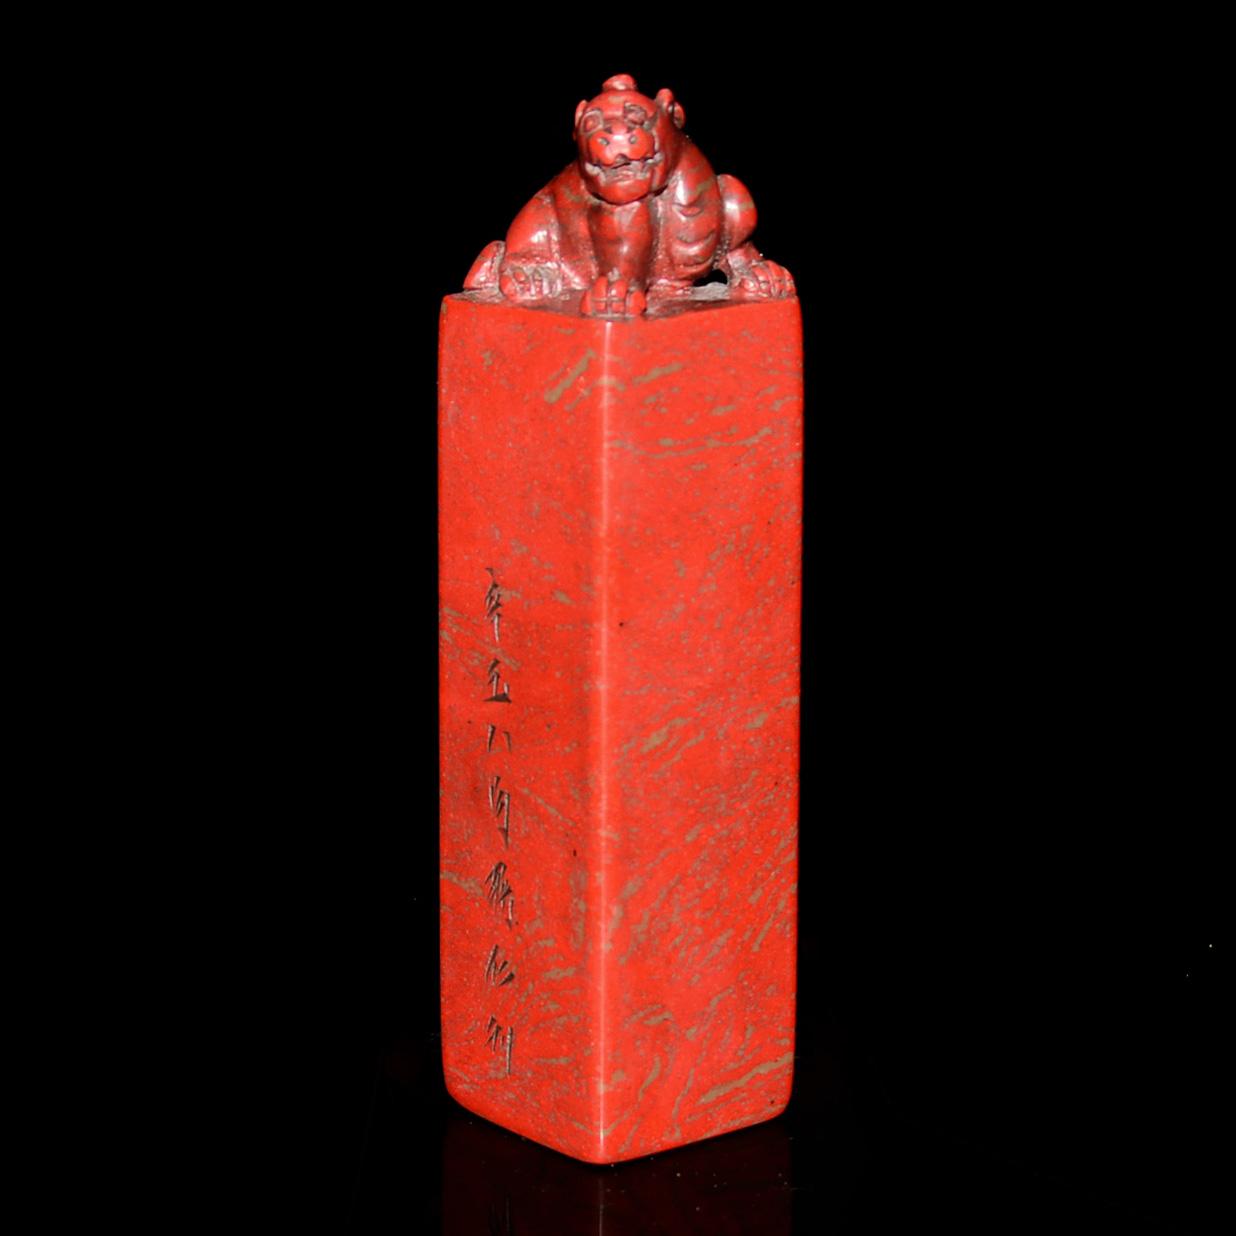 Lot 44 - 雞血石長辟邪鈕印章 印文(仁者無敵) 刻文(辛丑八月蔣仁刻) A Well Carved Tall Columnar Jixue Stone Seal with Bixie Knob